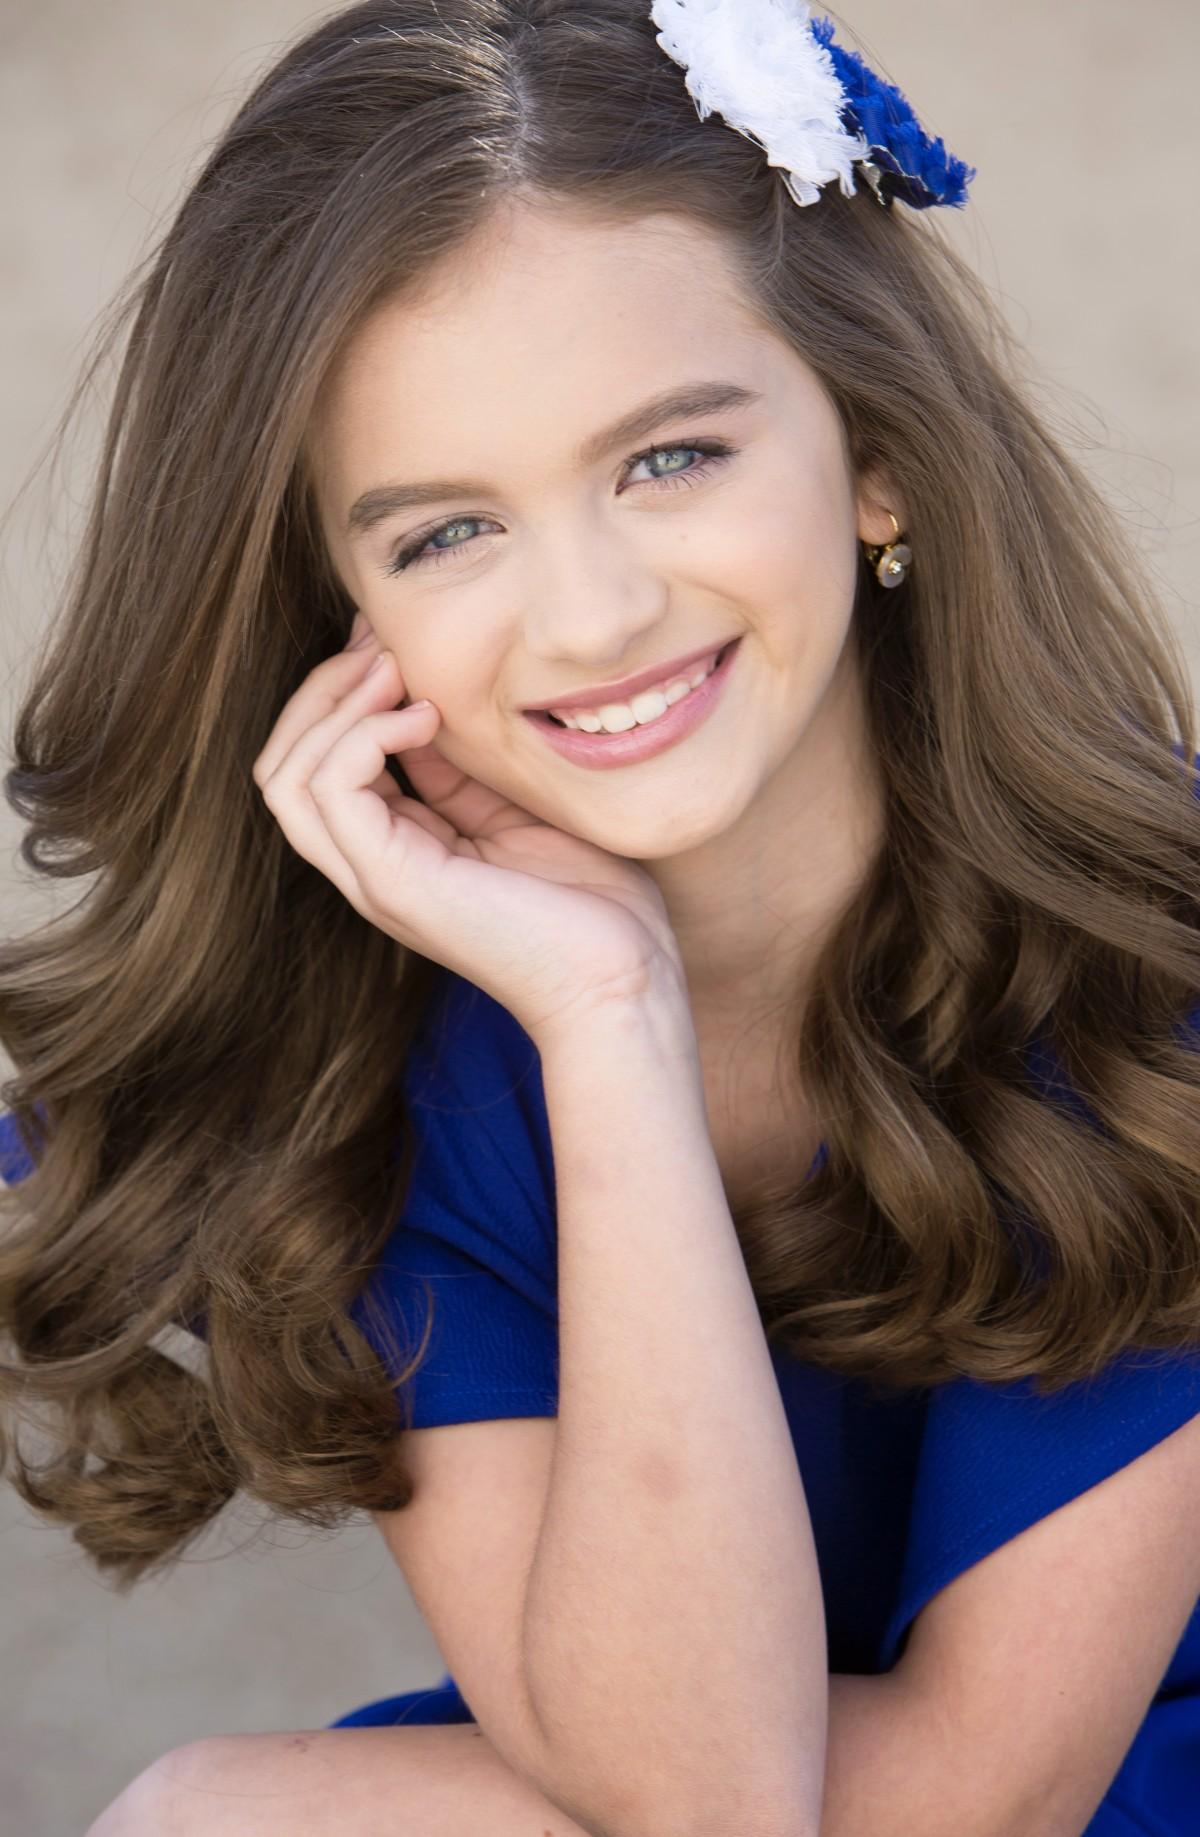 Mia Bella Wilson